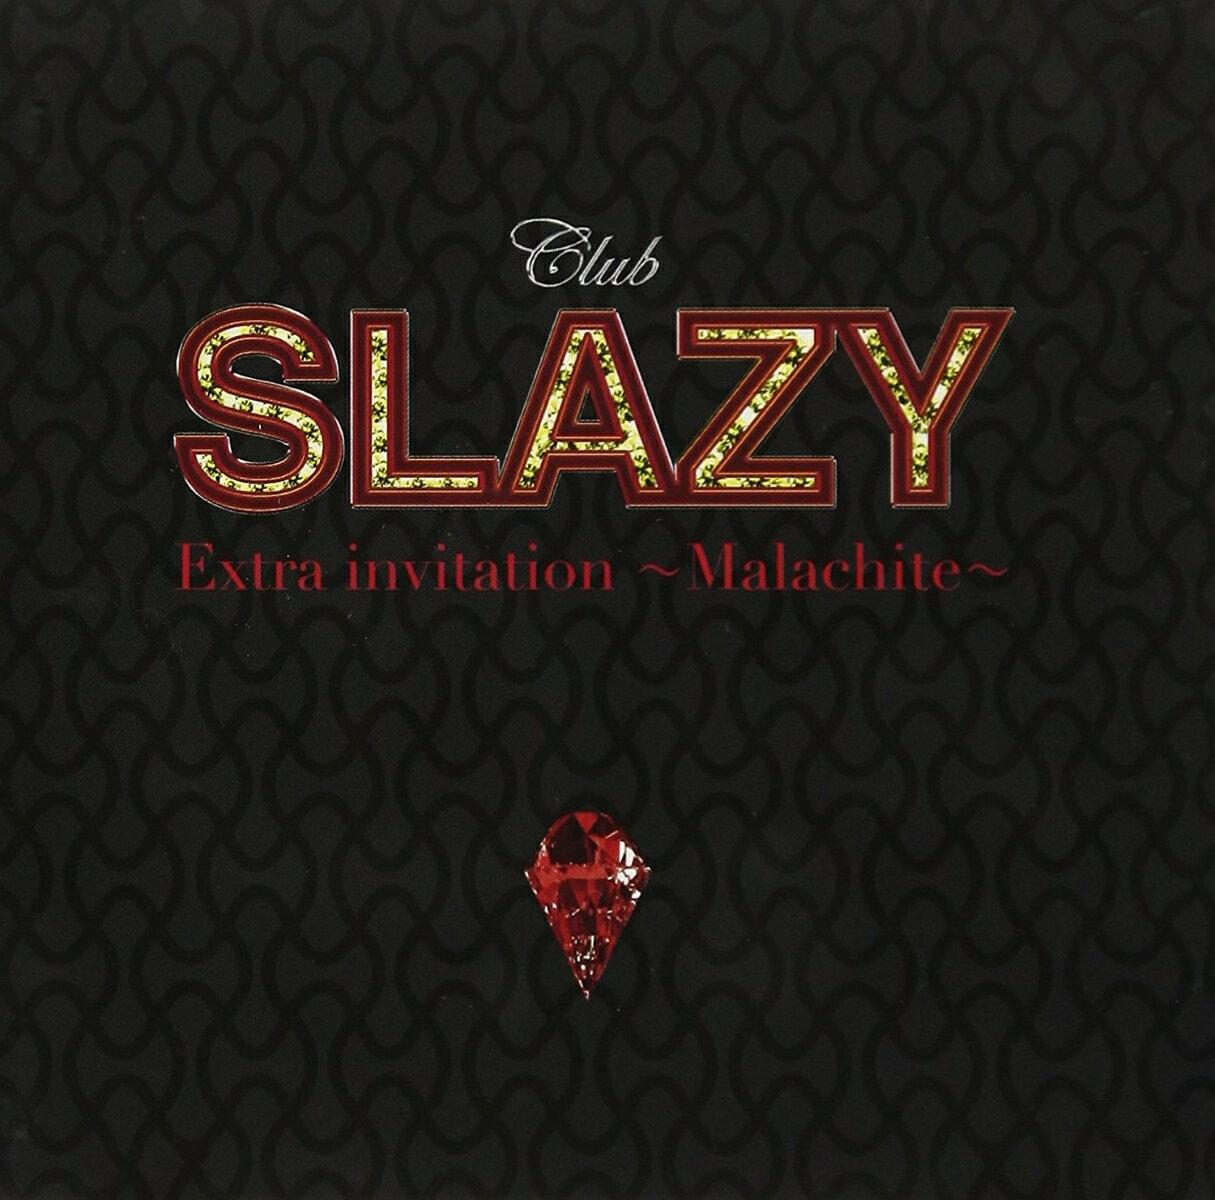 Club SLAZY Extra invitation 〜malachite〜CD [ TVサントラ ]